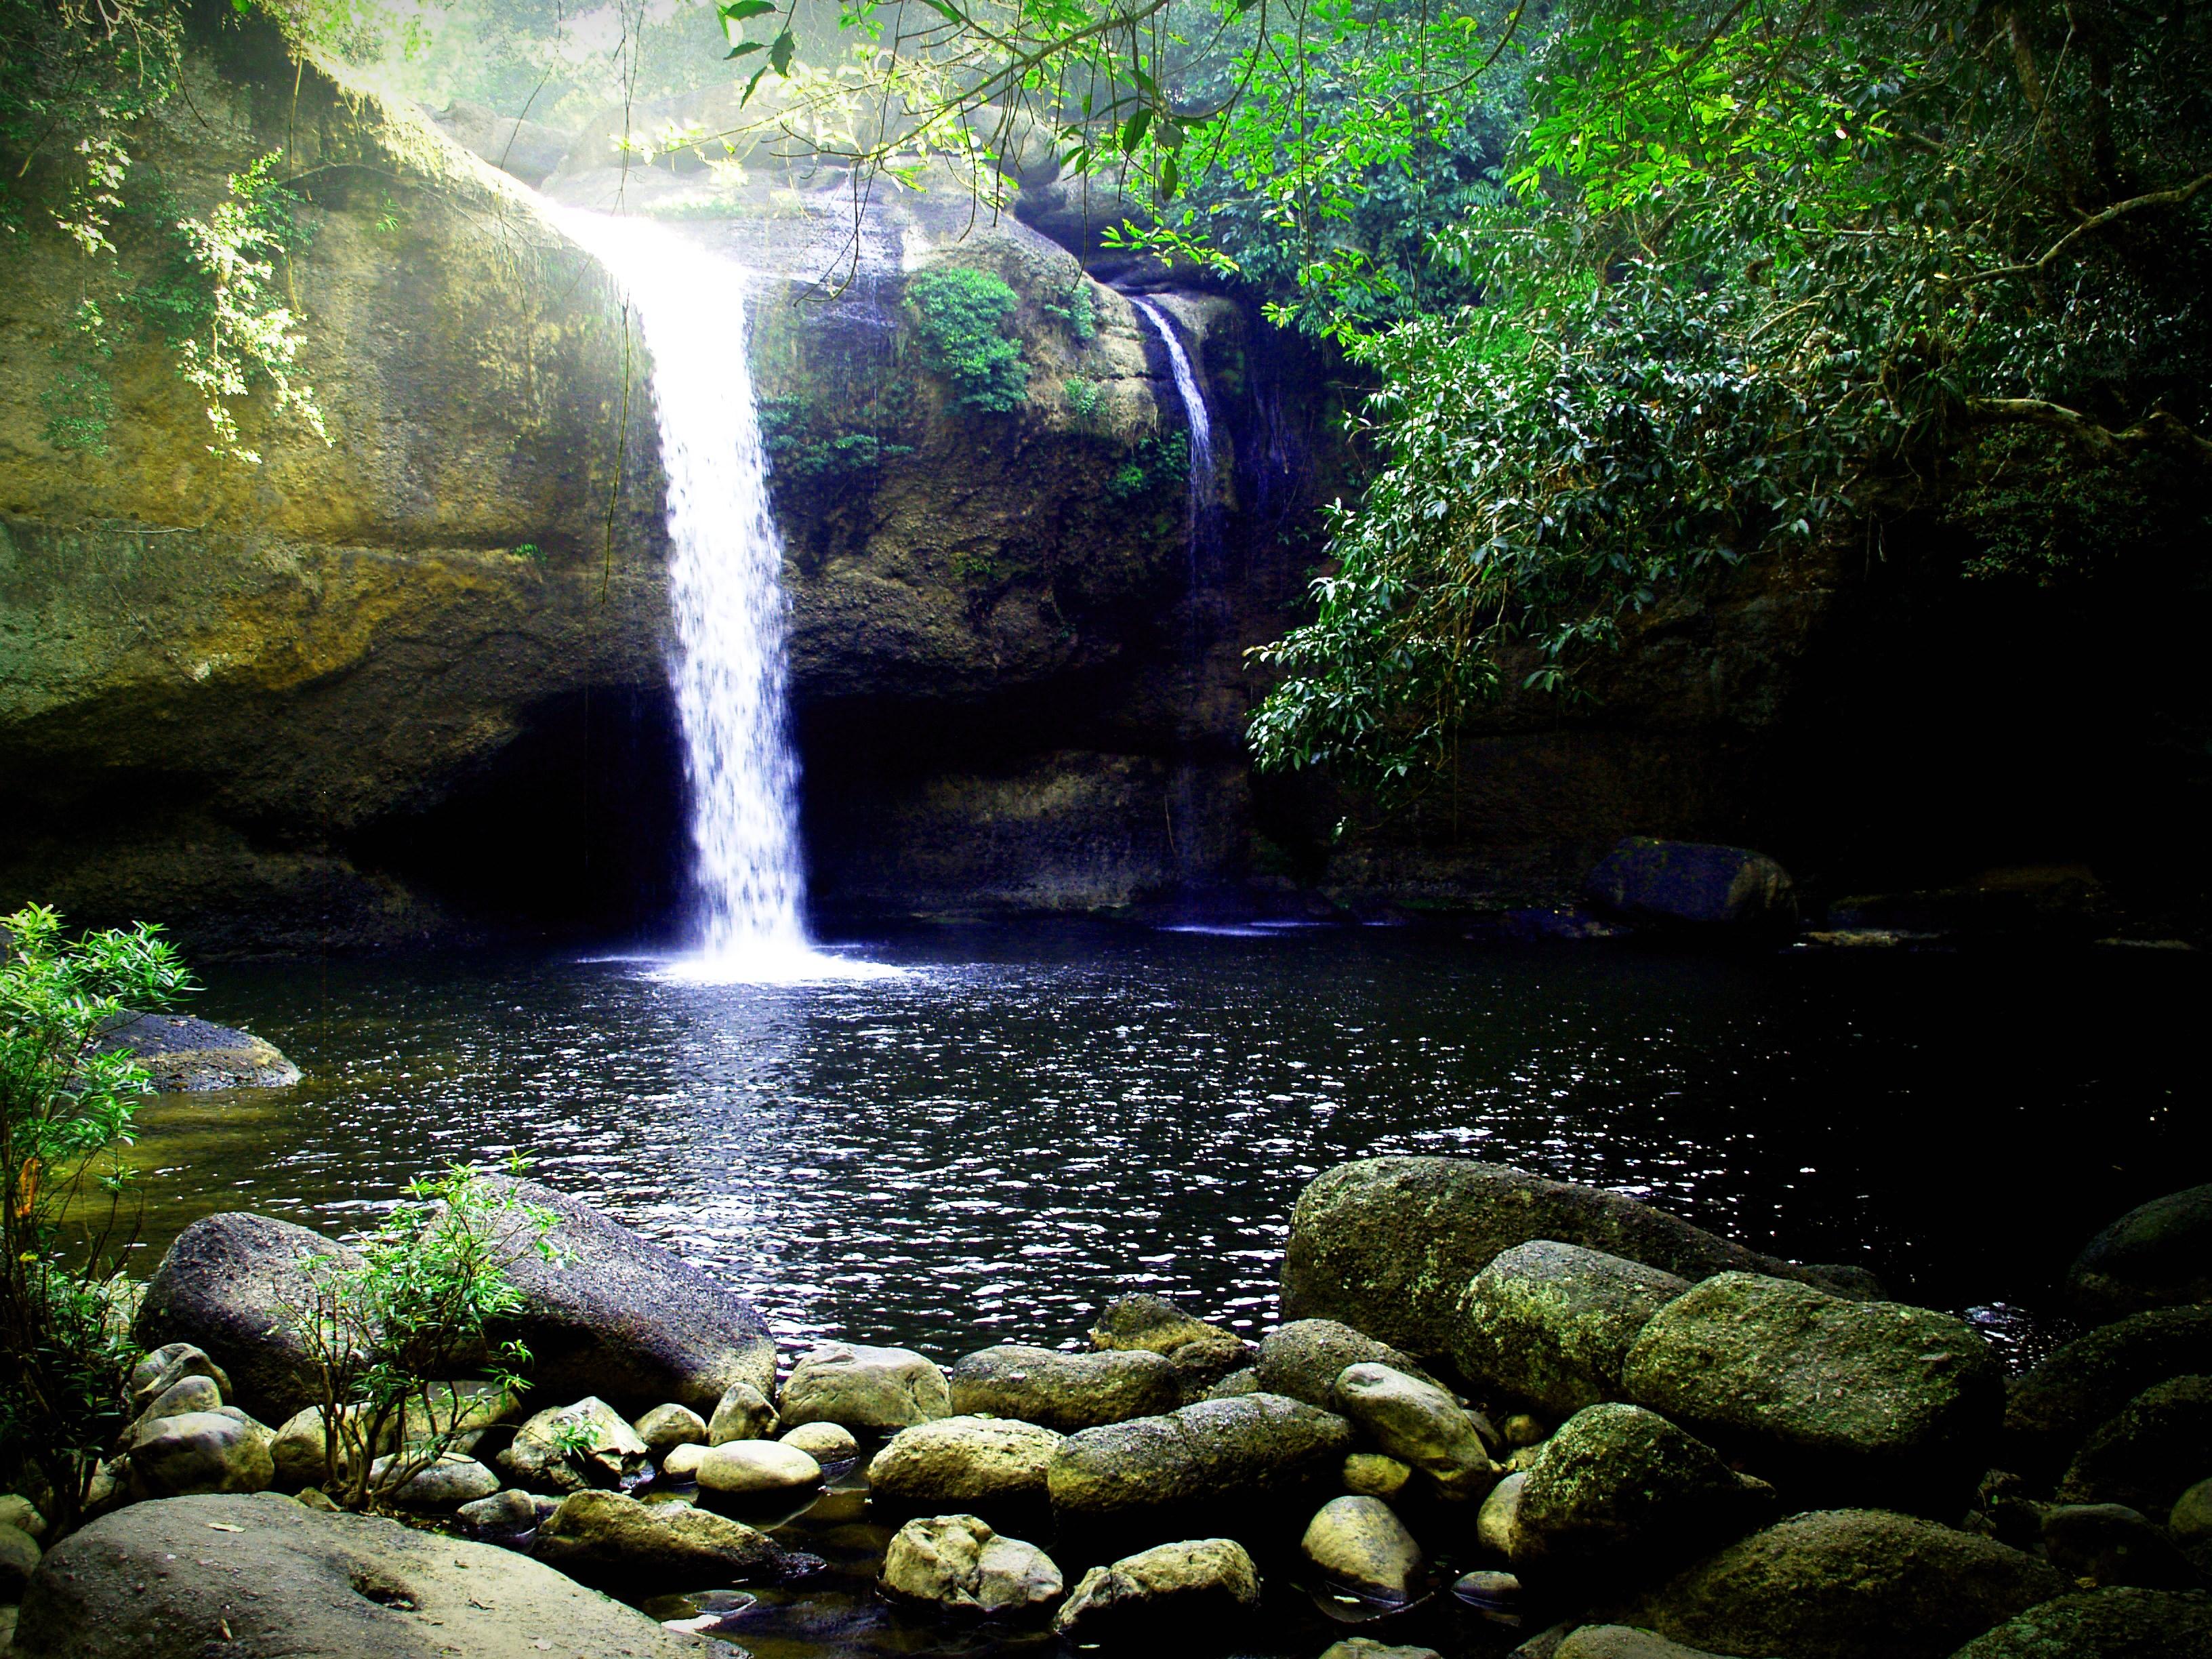 Waterfalls Desktop Wallpaper Forest Falls Waterfall Images 183 Pexels 183 Free Stock Photos